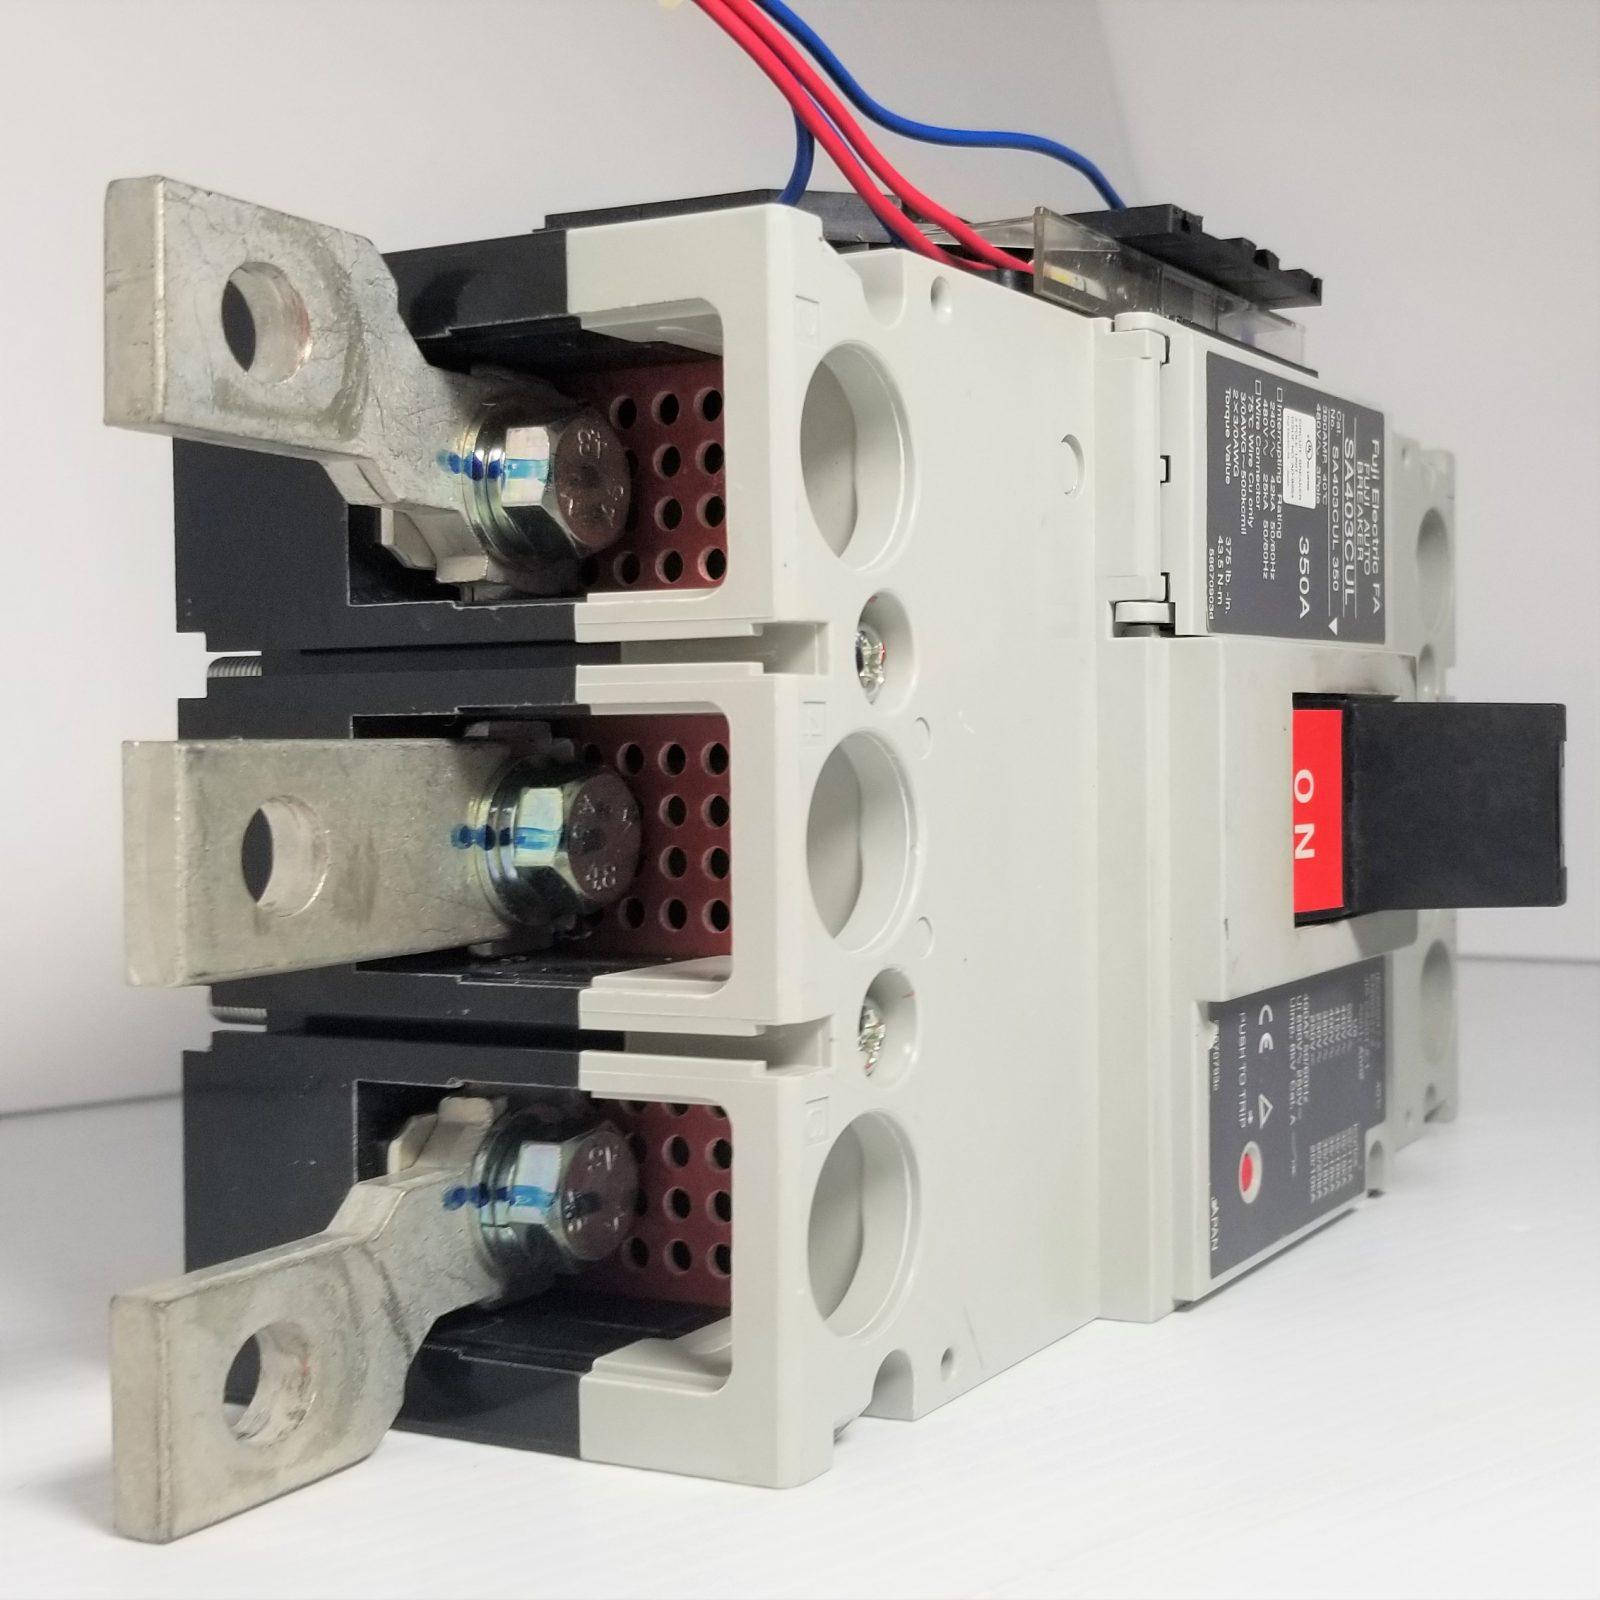 Fuji Electric SA403CUL Circuit Breaker, 350-Amp 480V 3-Pole